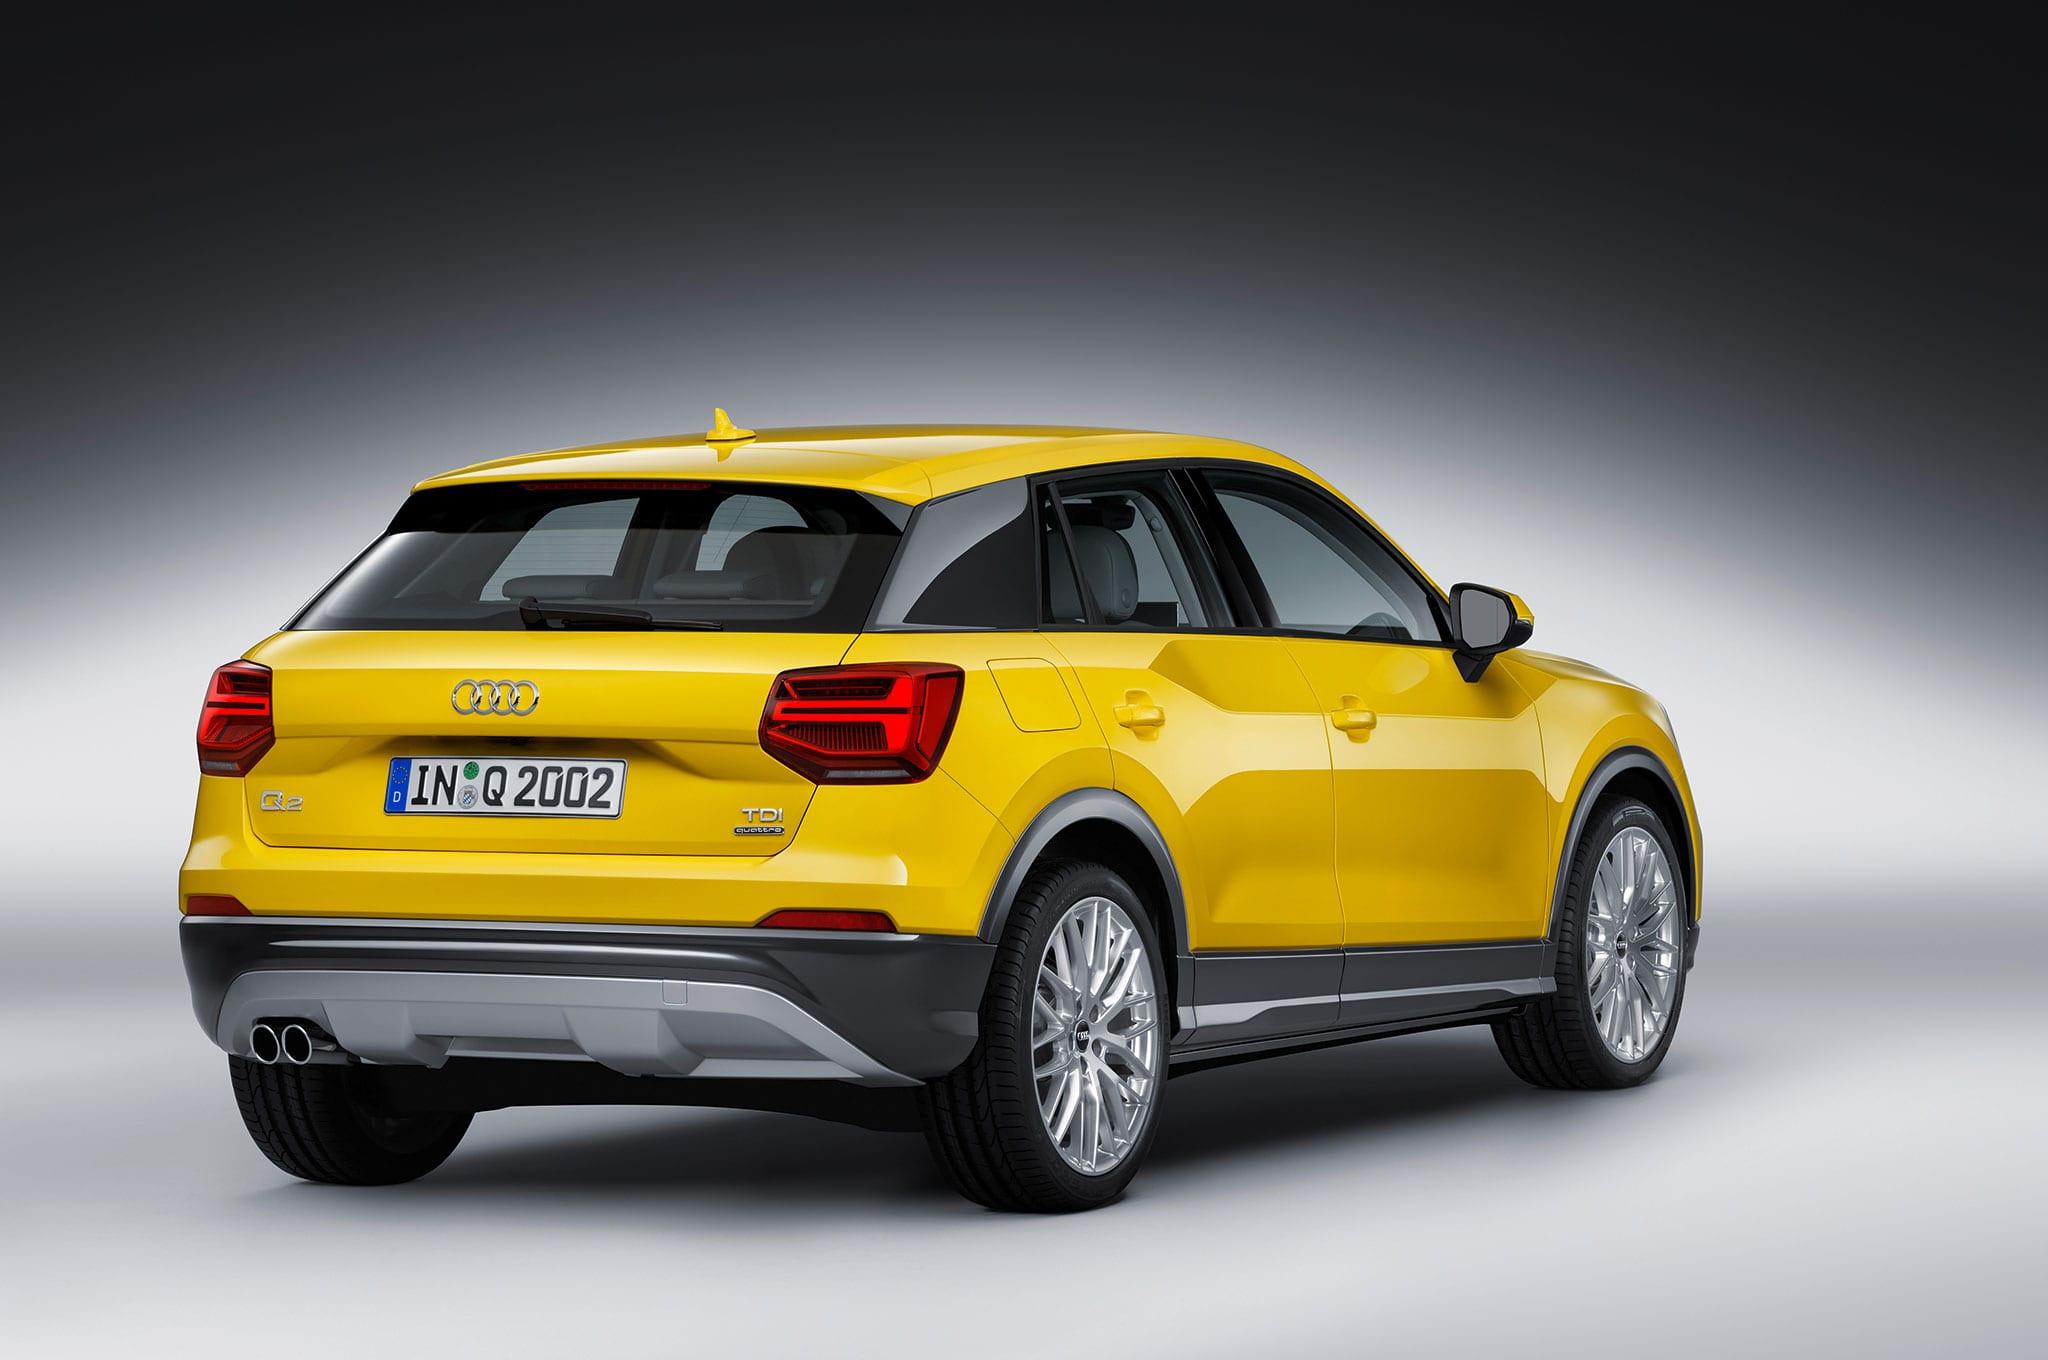 Audi Q2 HD pictures